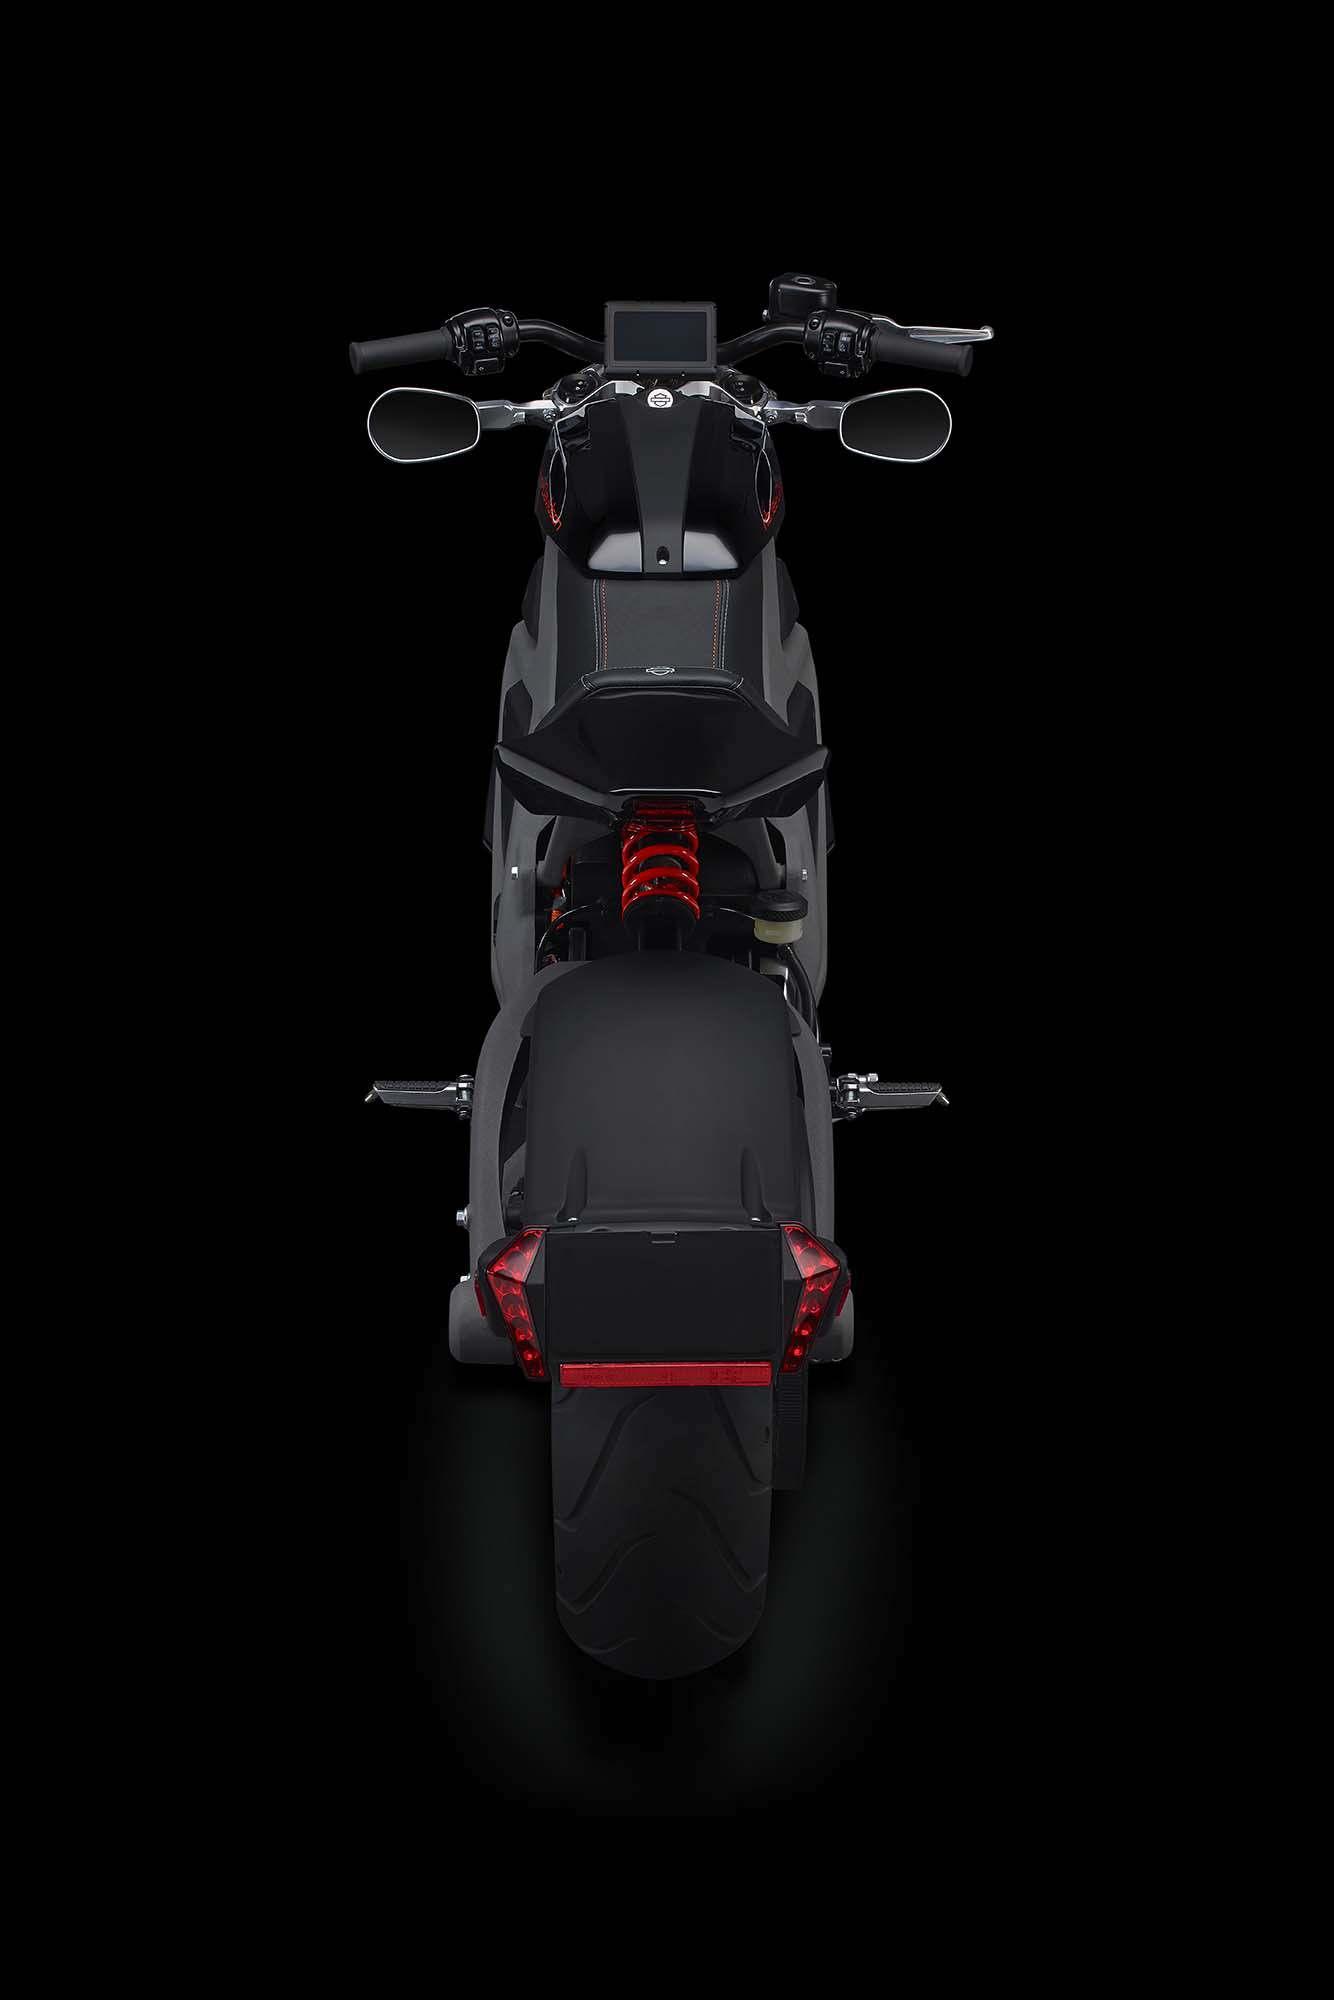 Harley-Davidson Livewire 3